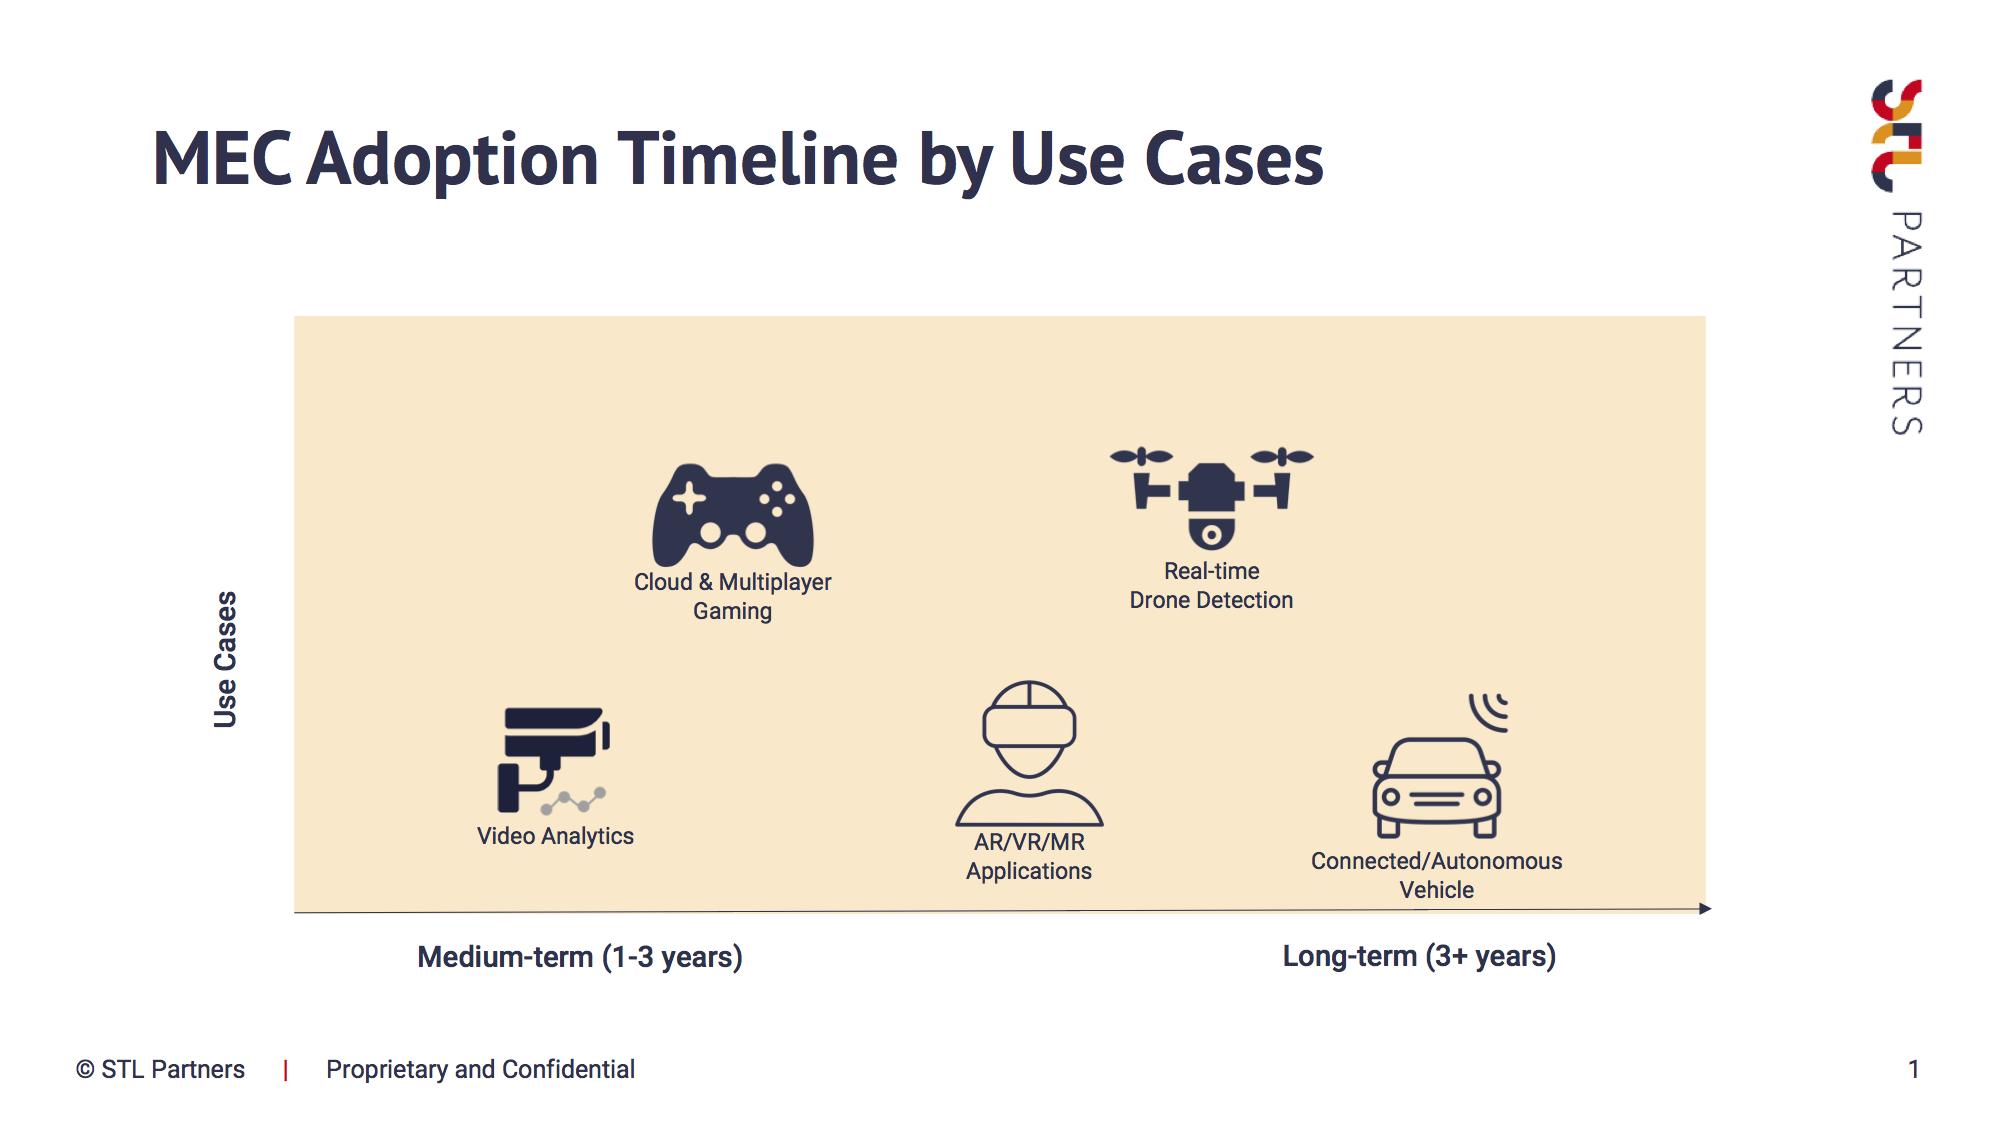 MEC Adoption Timeline By Use Cases